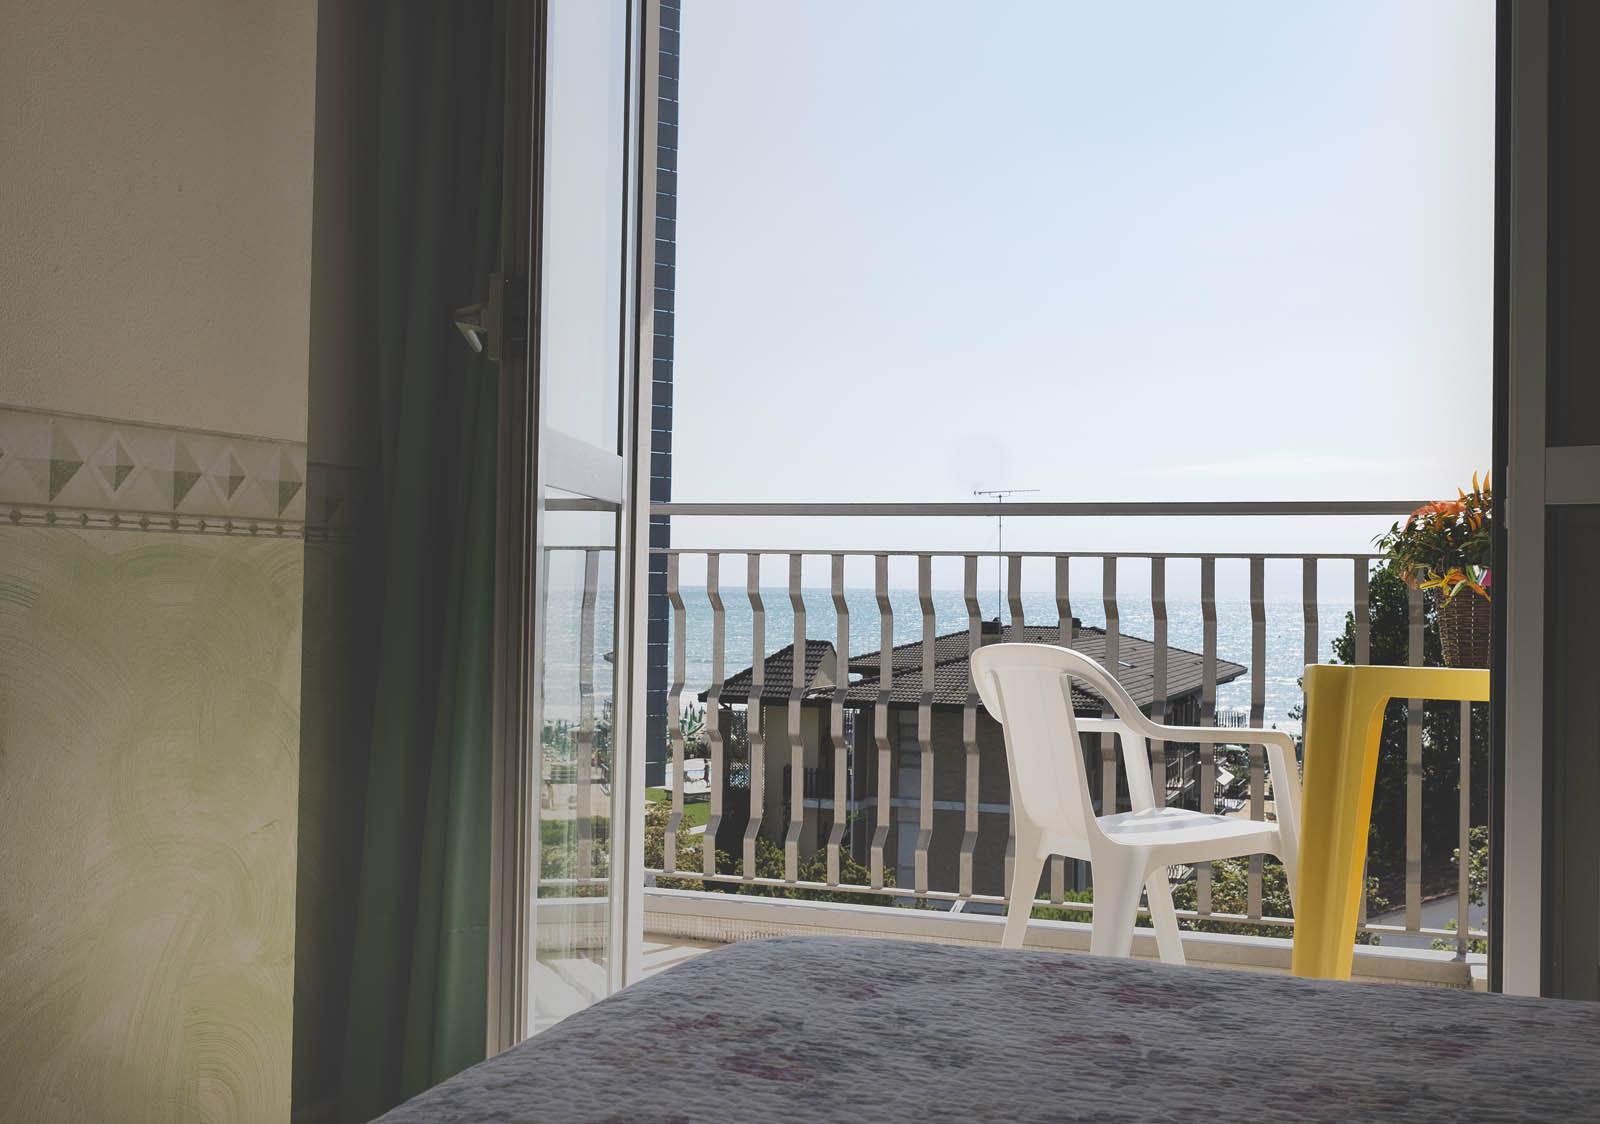 zimmer acapulco beach resort. Black Bedroom Furniture Sets. Home Design Ideas